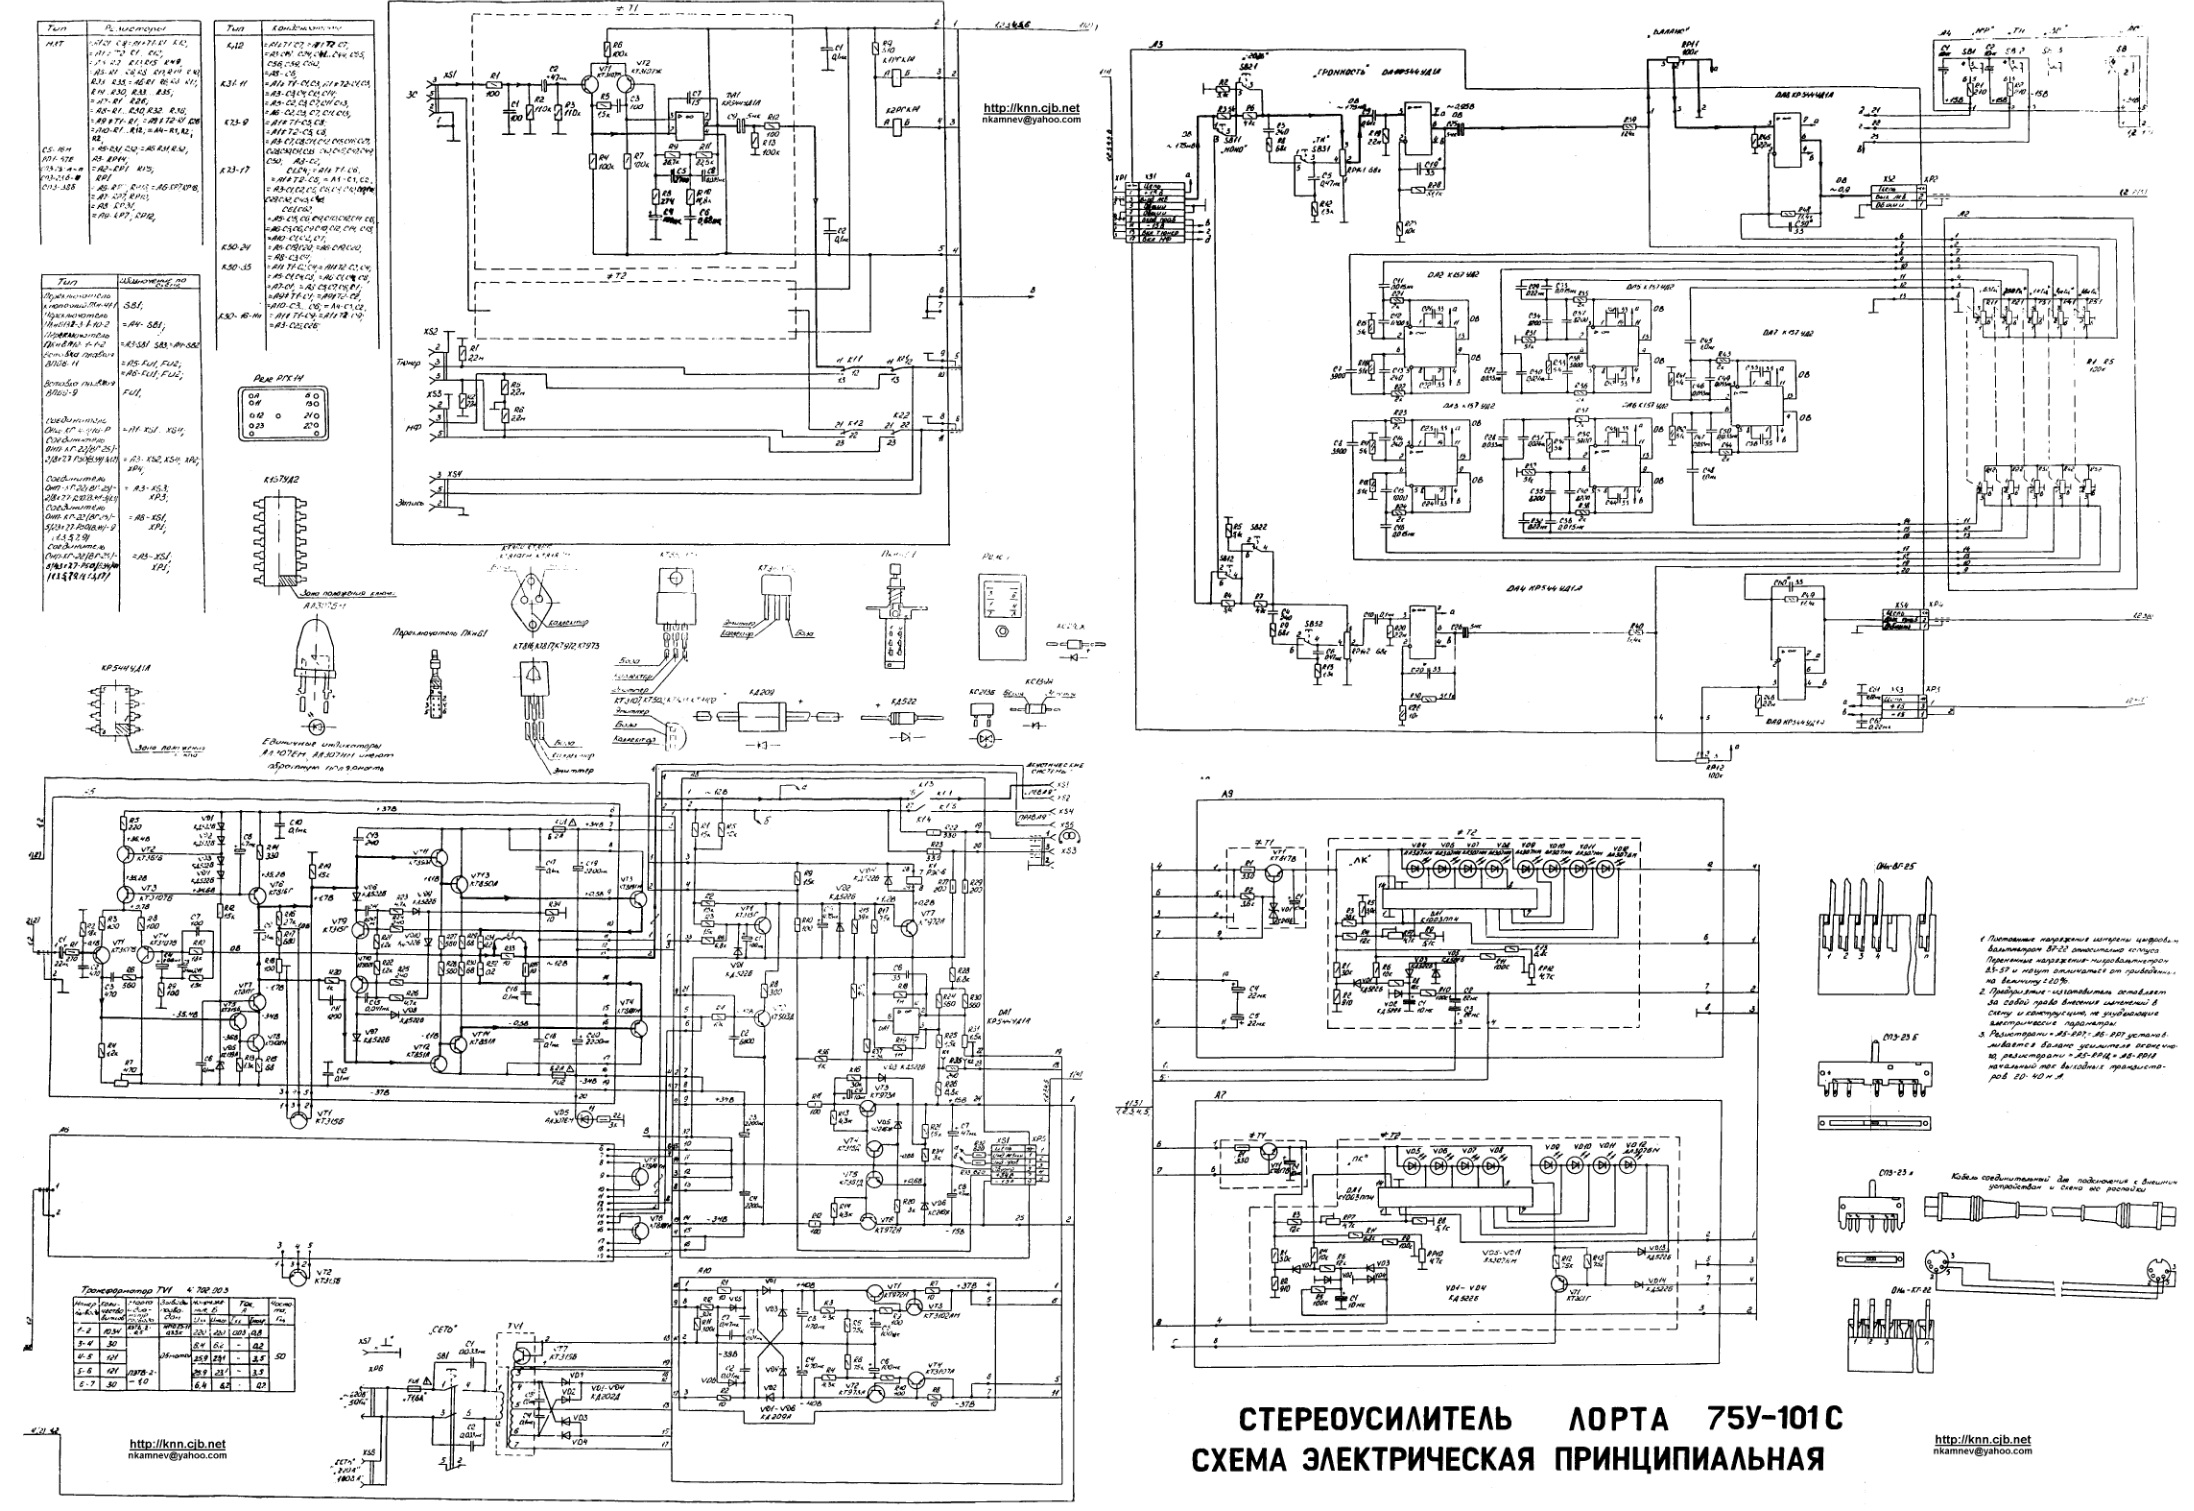 Схема усилителя электроника-043